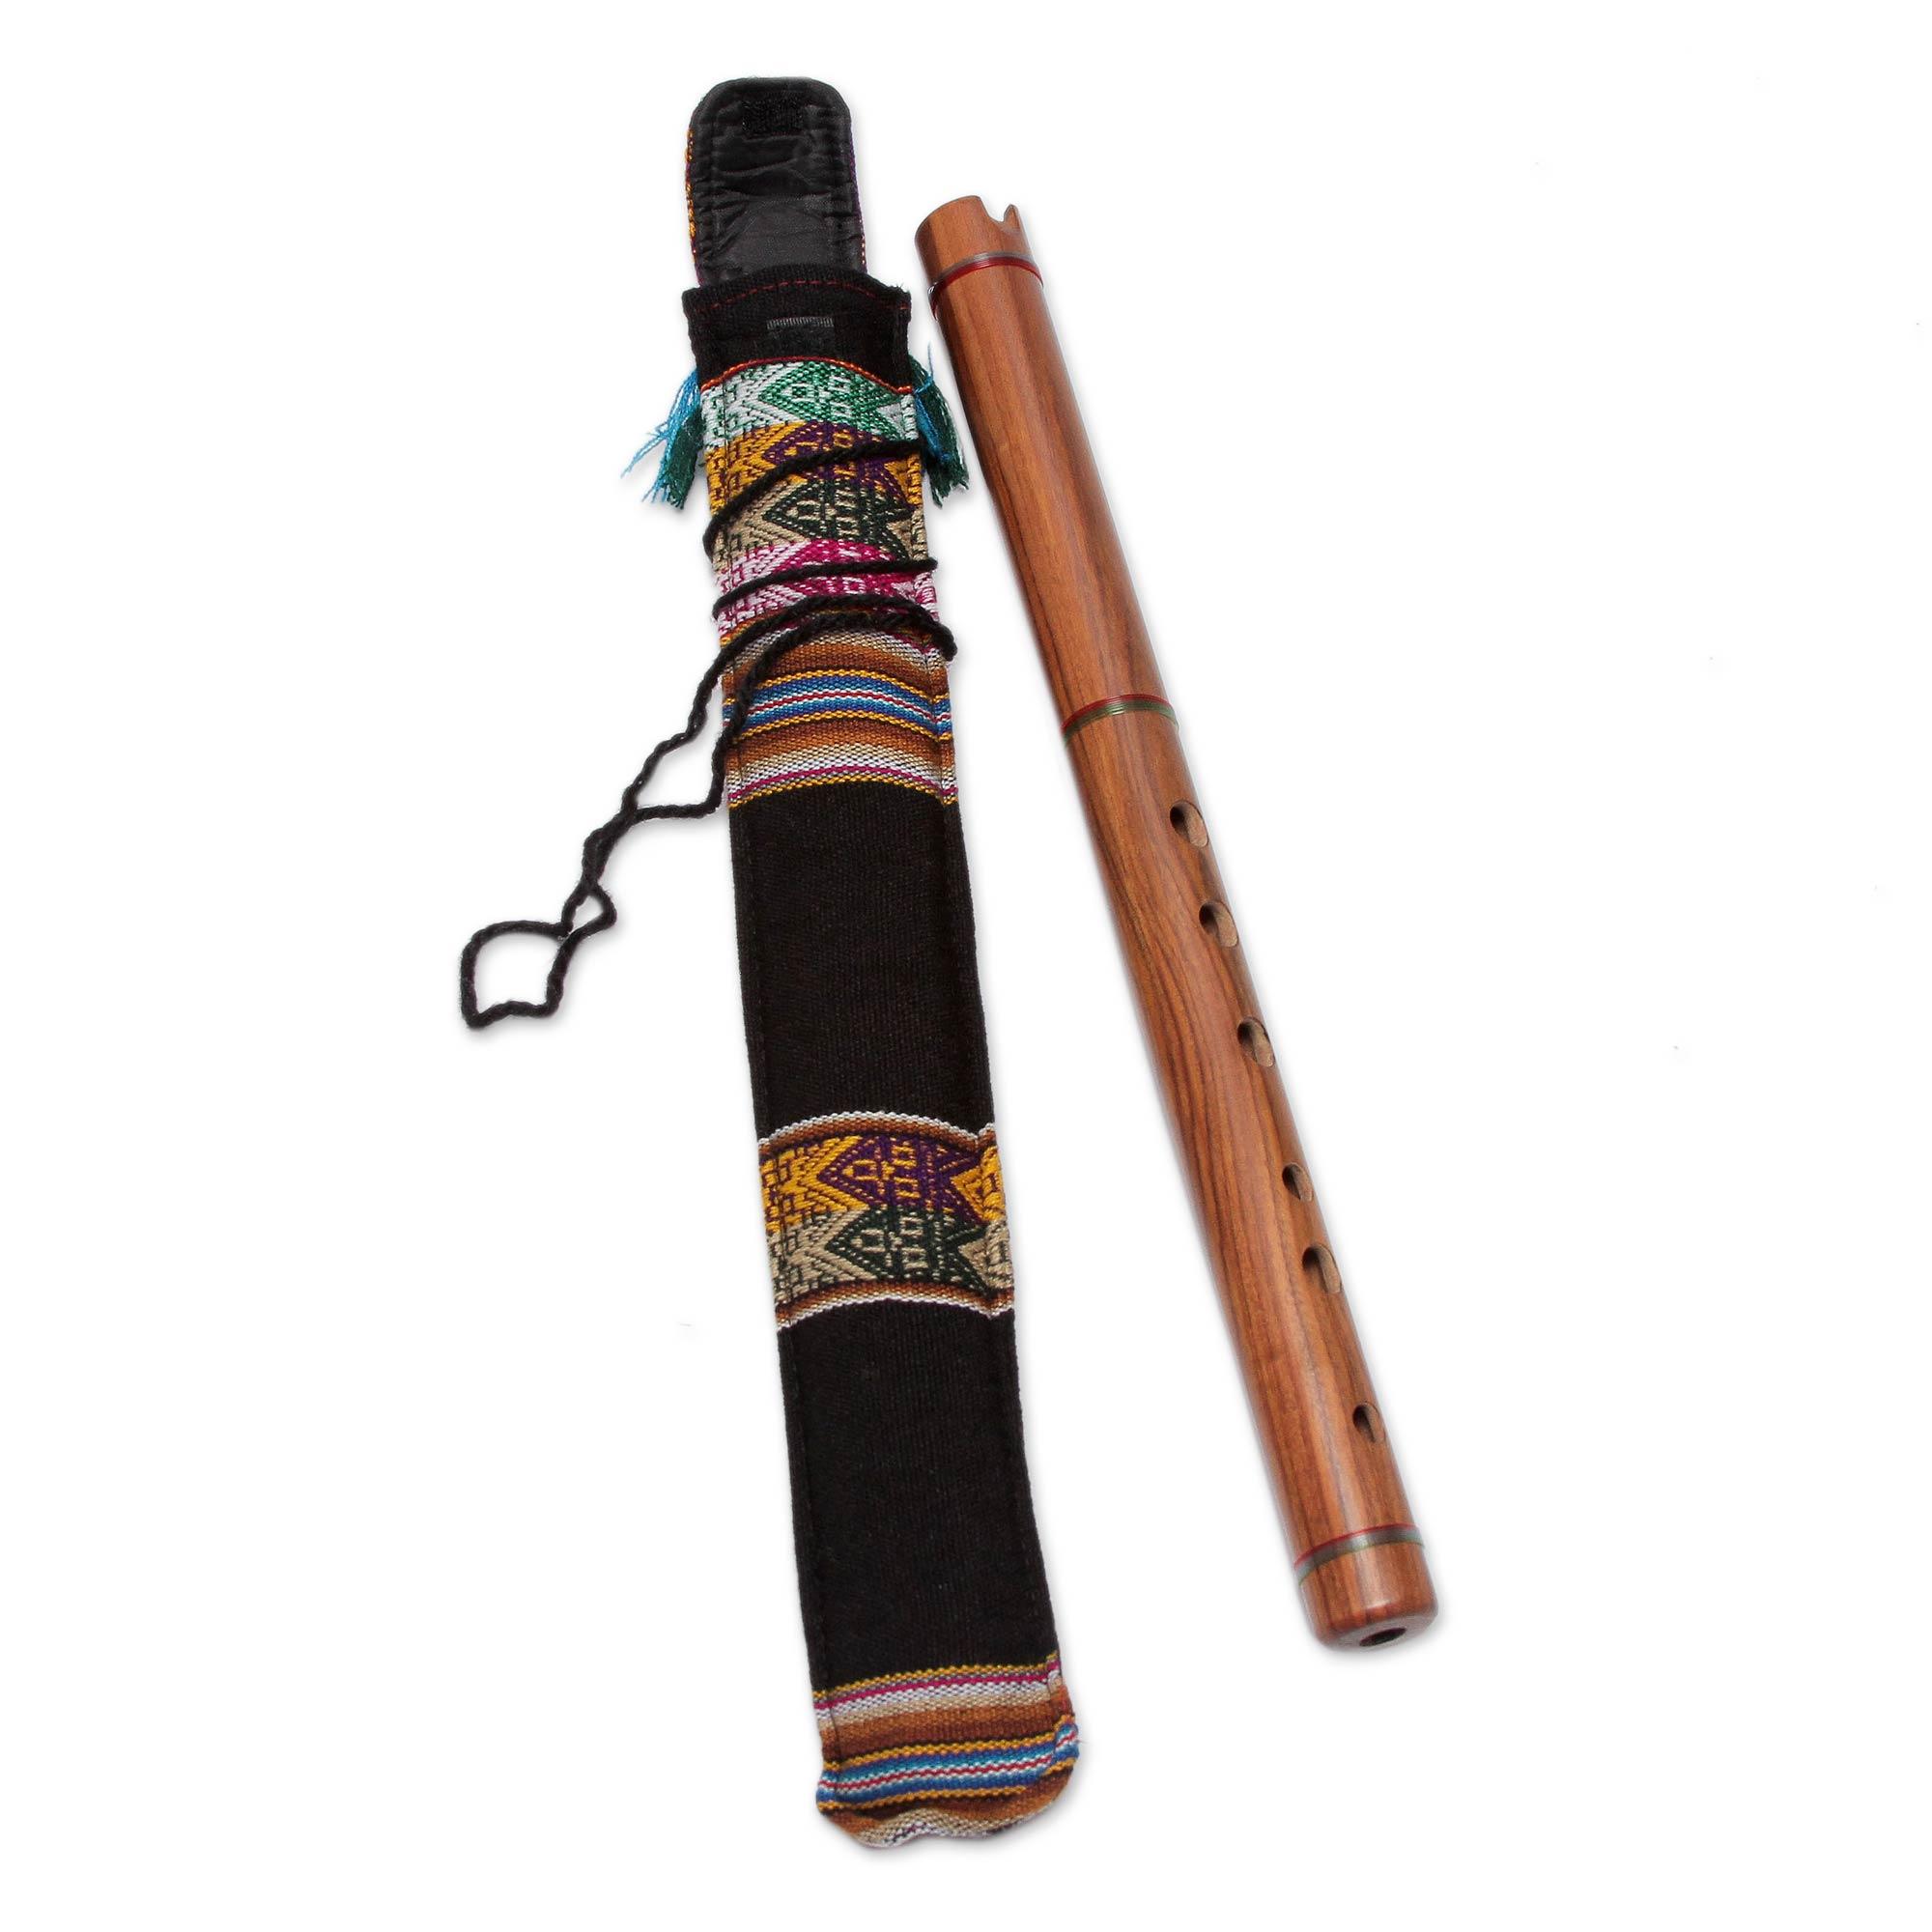 Quena Wood Inca Flute with Case Handmade in Peru - Jacaranda   NOVICA